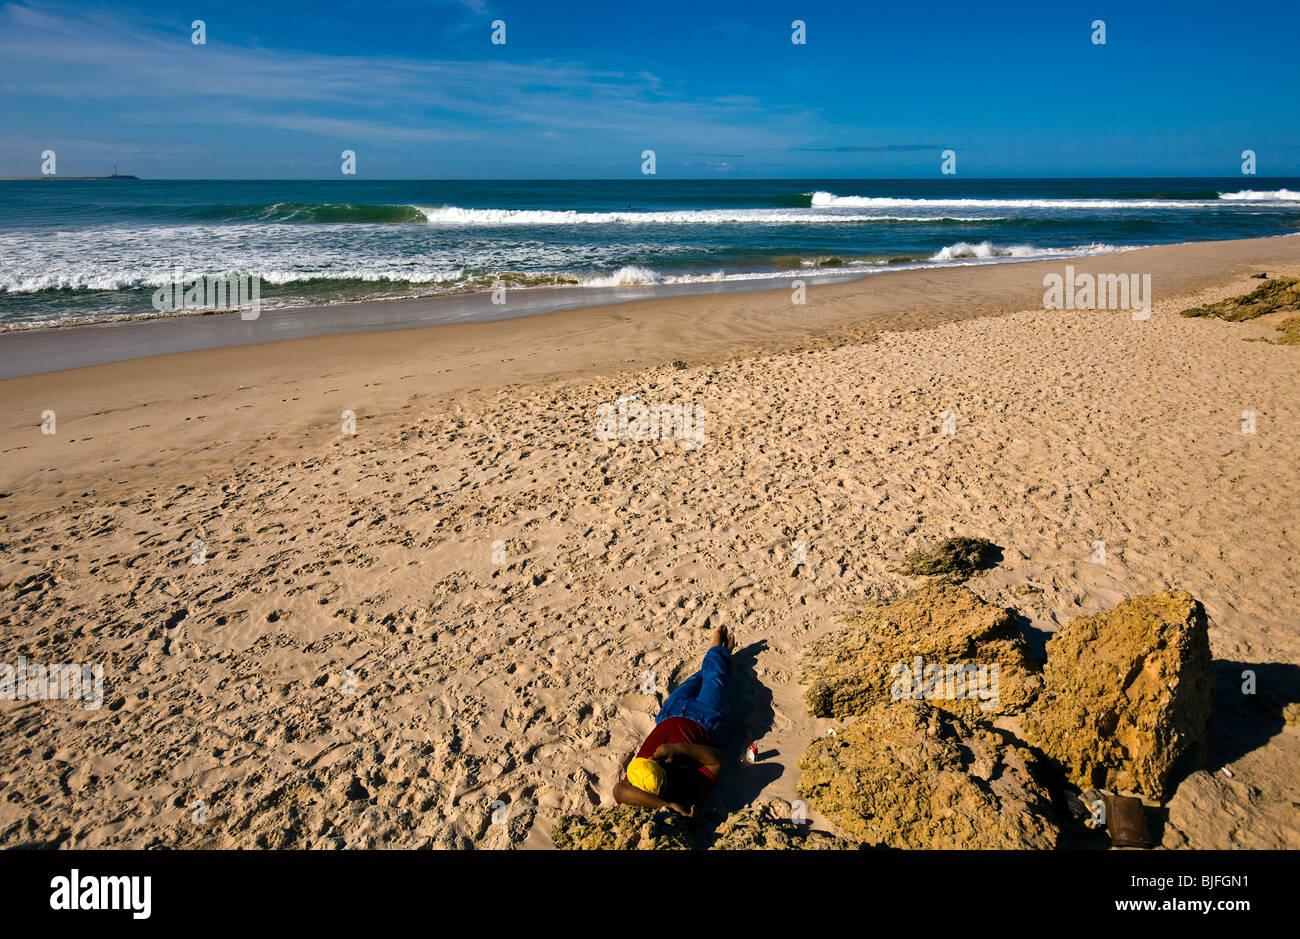 Western Sahara, Dakhla Peninsula, waves, North Atlantic Ocean. - Stock Image